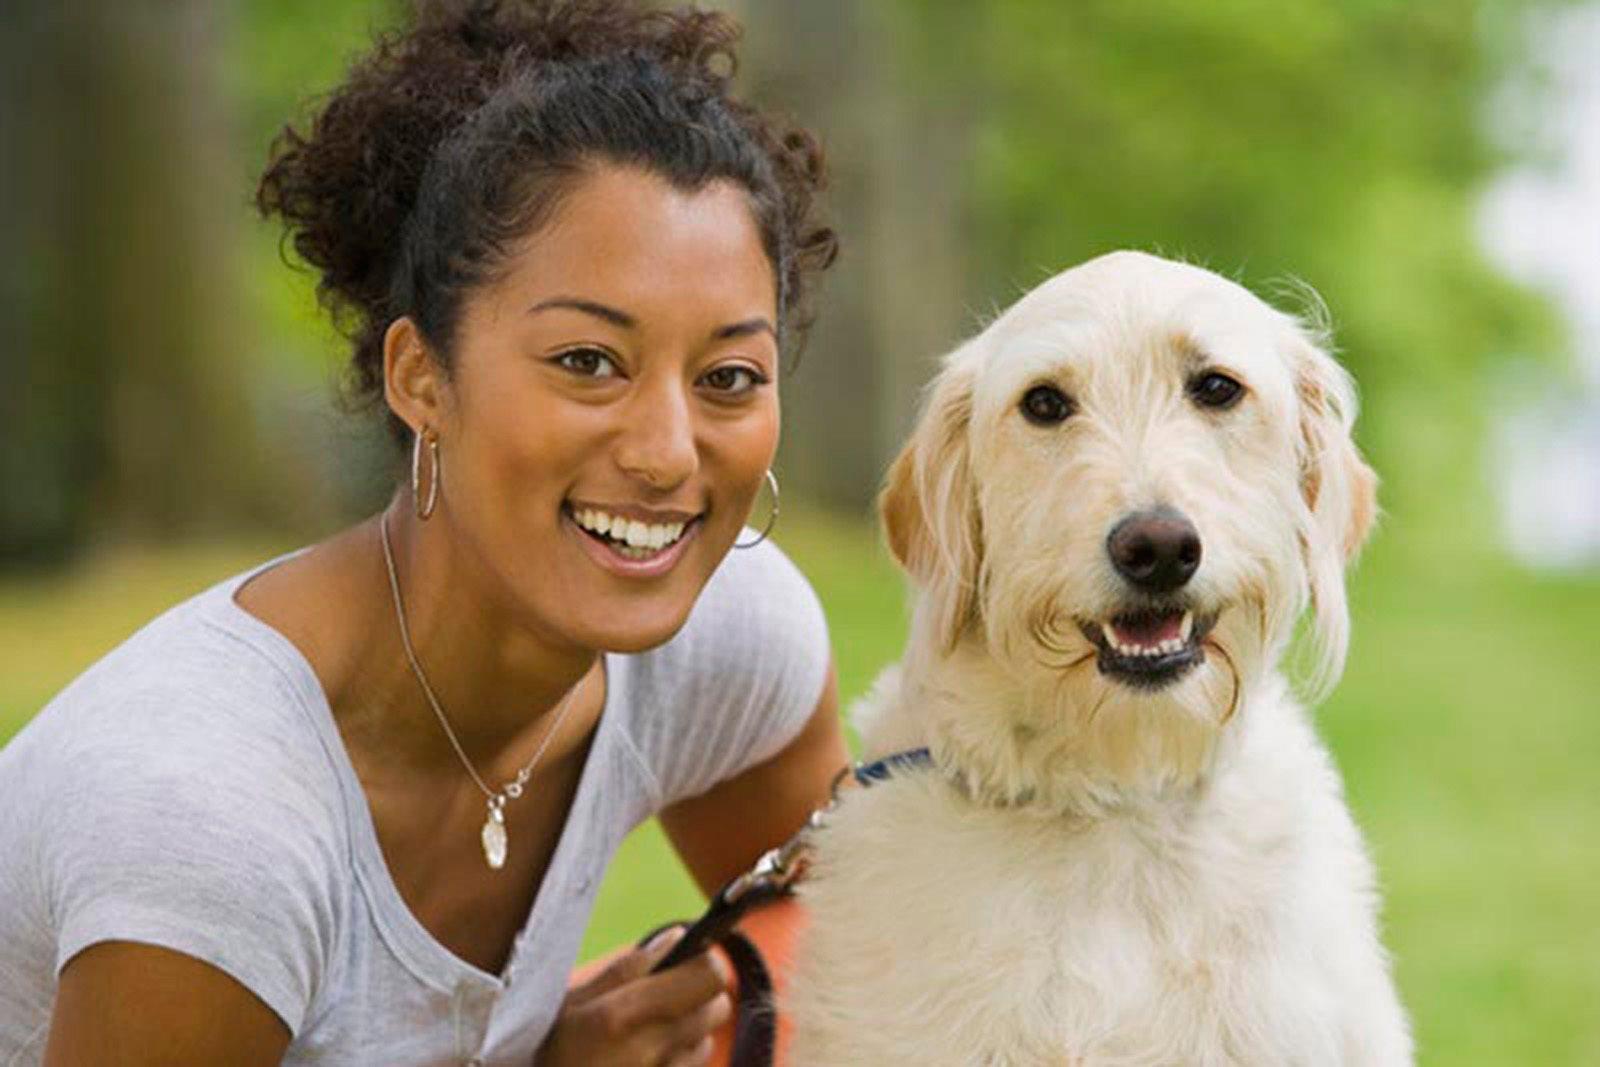 Pet-Friendly Apartments and Community at Windsor Lantana Hills, 6601 Rialto Blvd, TX